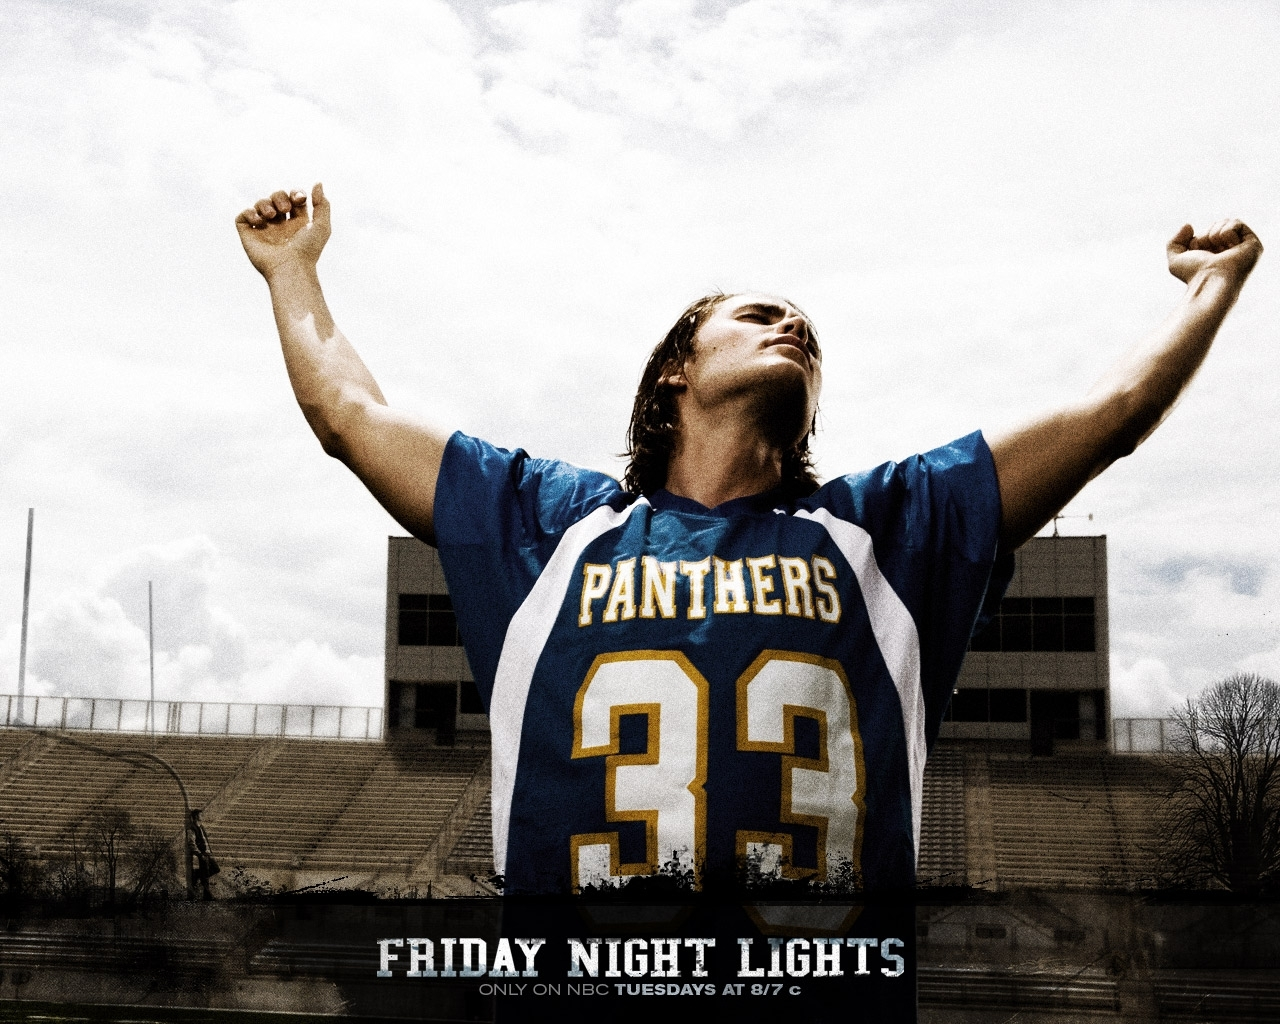 15 friday night lights fonds d'écran hd | arrière-plans - wallpaper